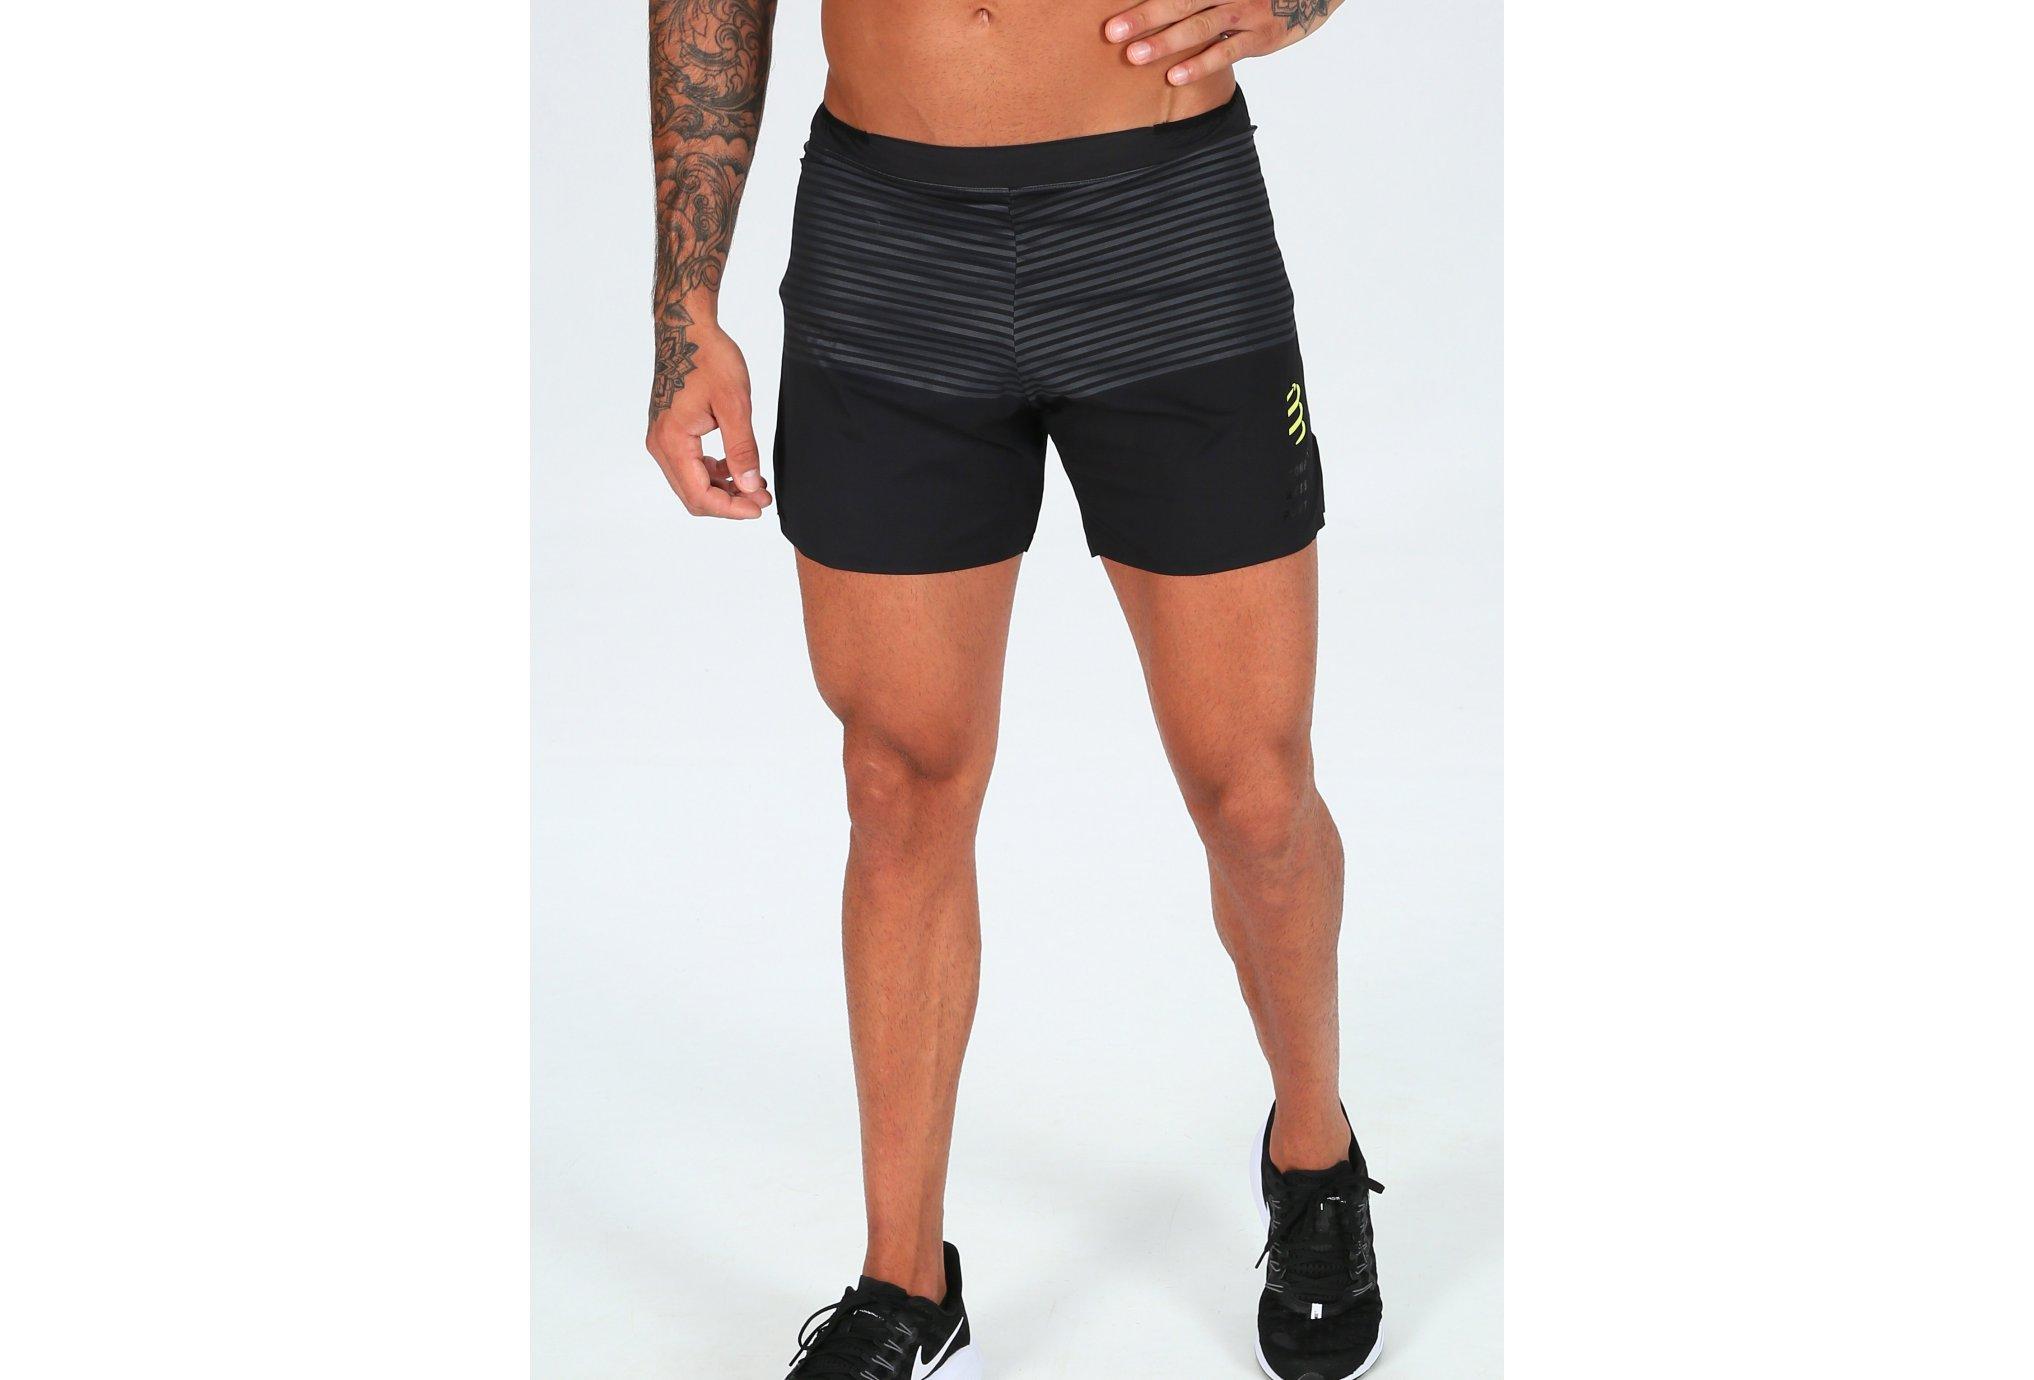 Compressport Performance Black Édition M vêtement running homme